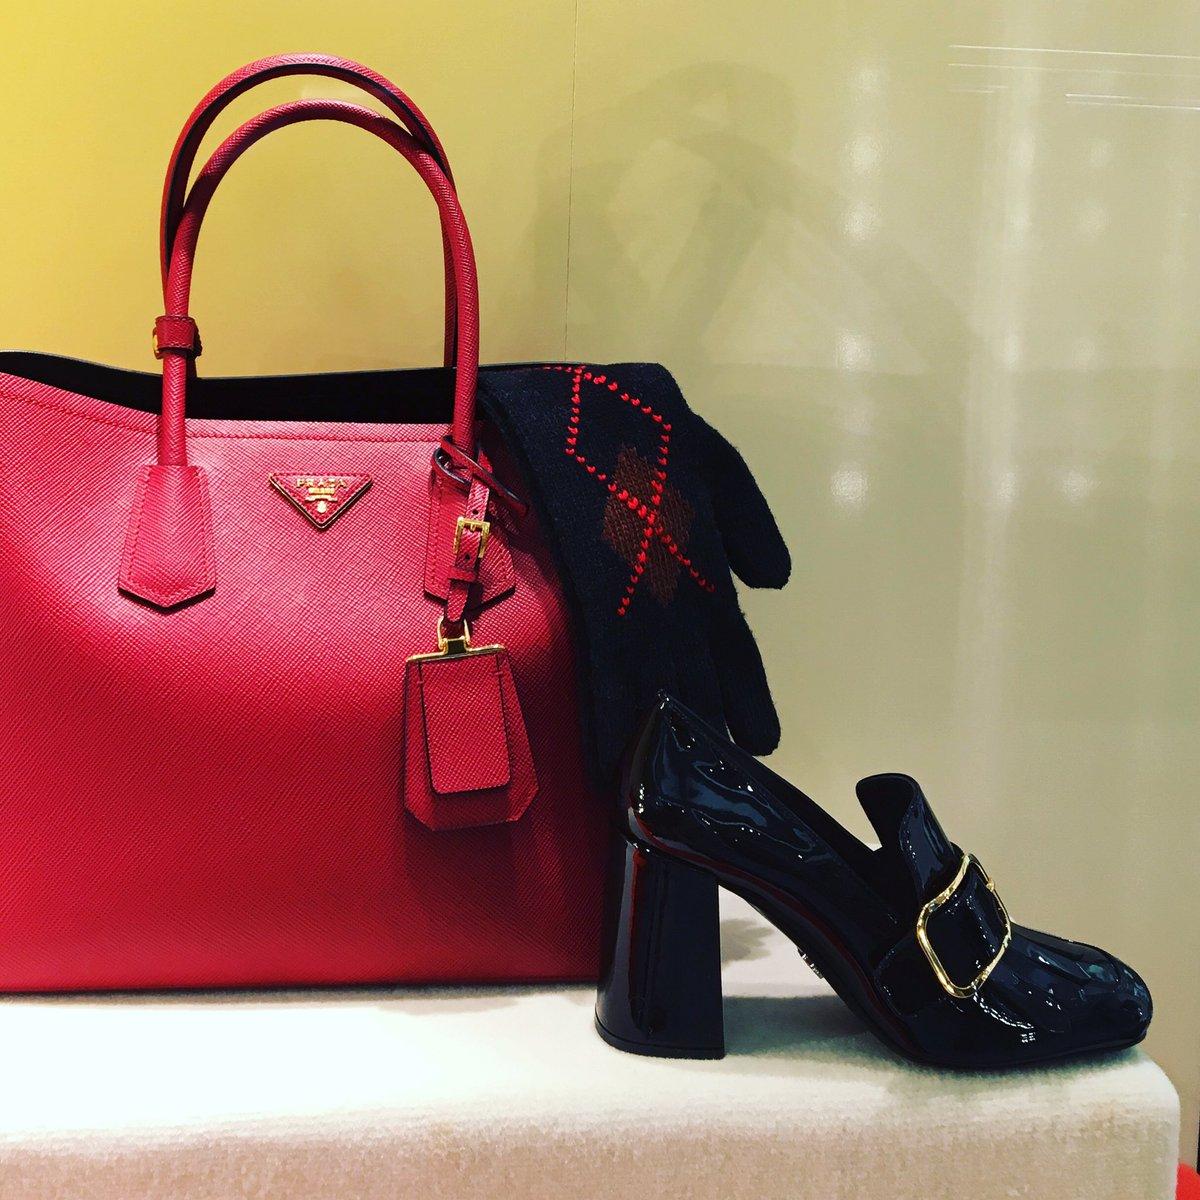 Brix And Bailey On Twitter Fabulous Handbag Shoes Fuschia Bags Style Prada Selfridges